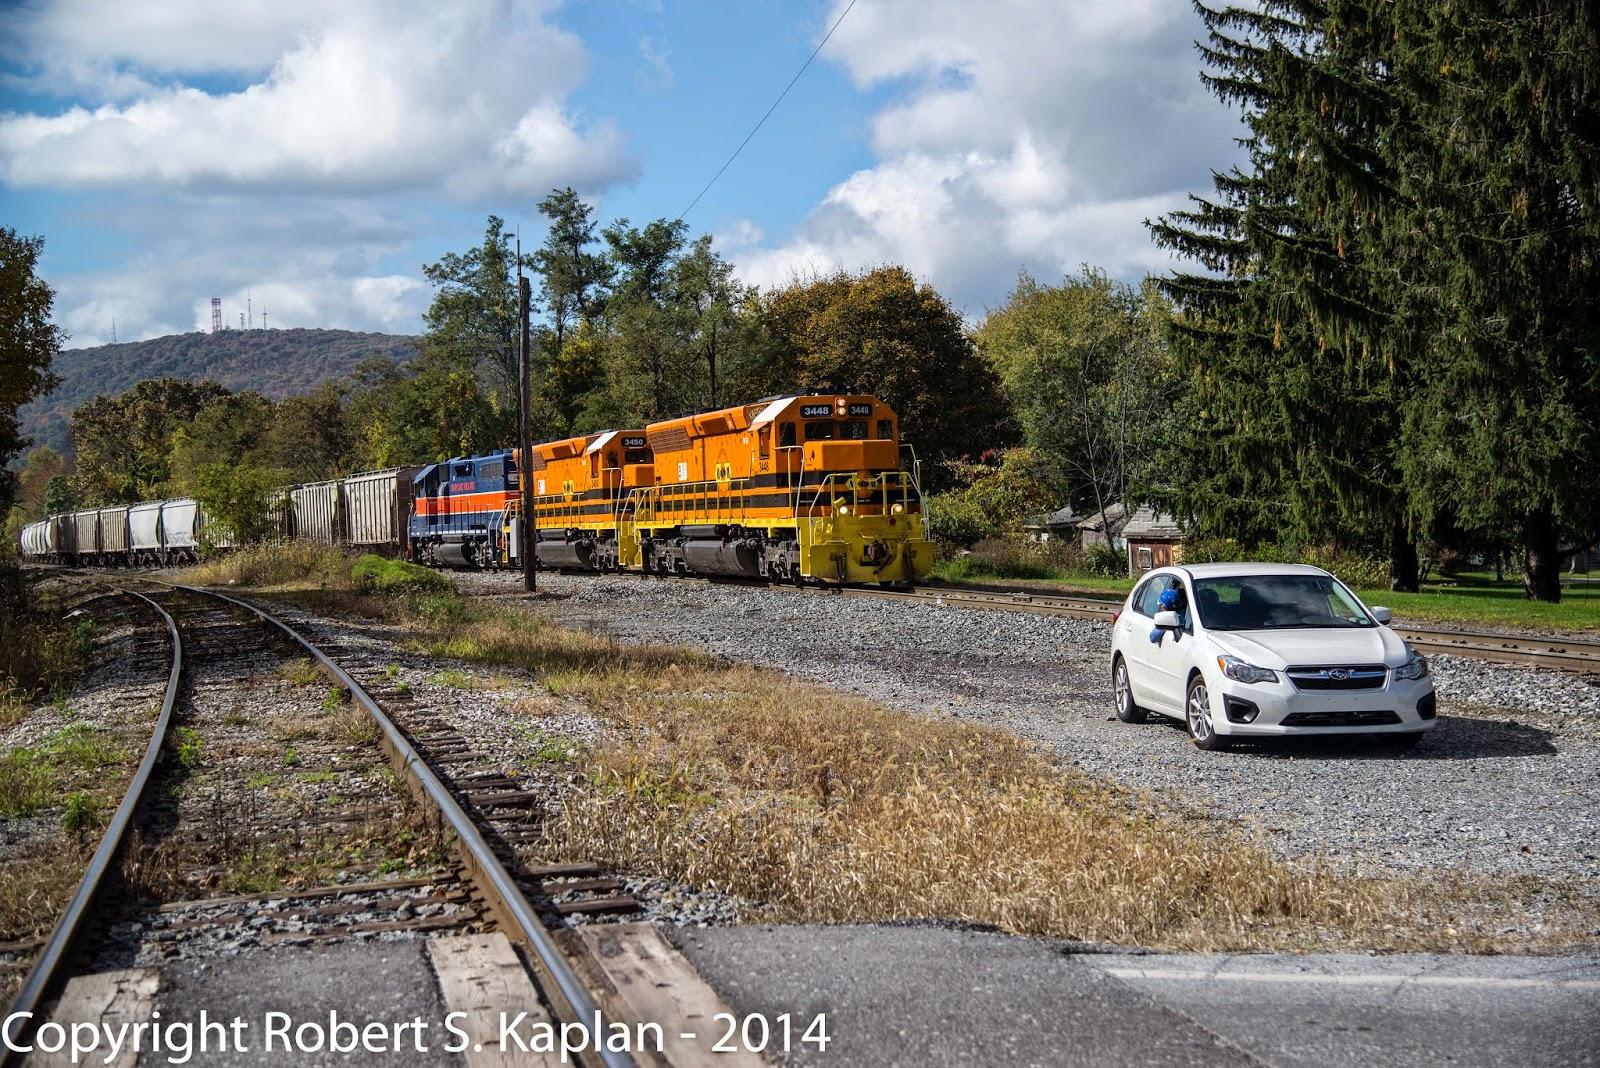 Capitol Limited: Railfanning the Maryland Midland